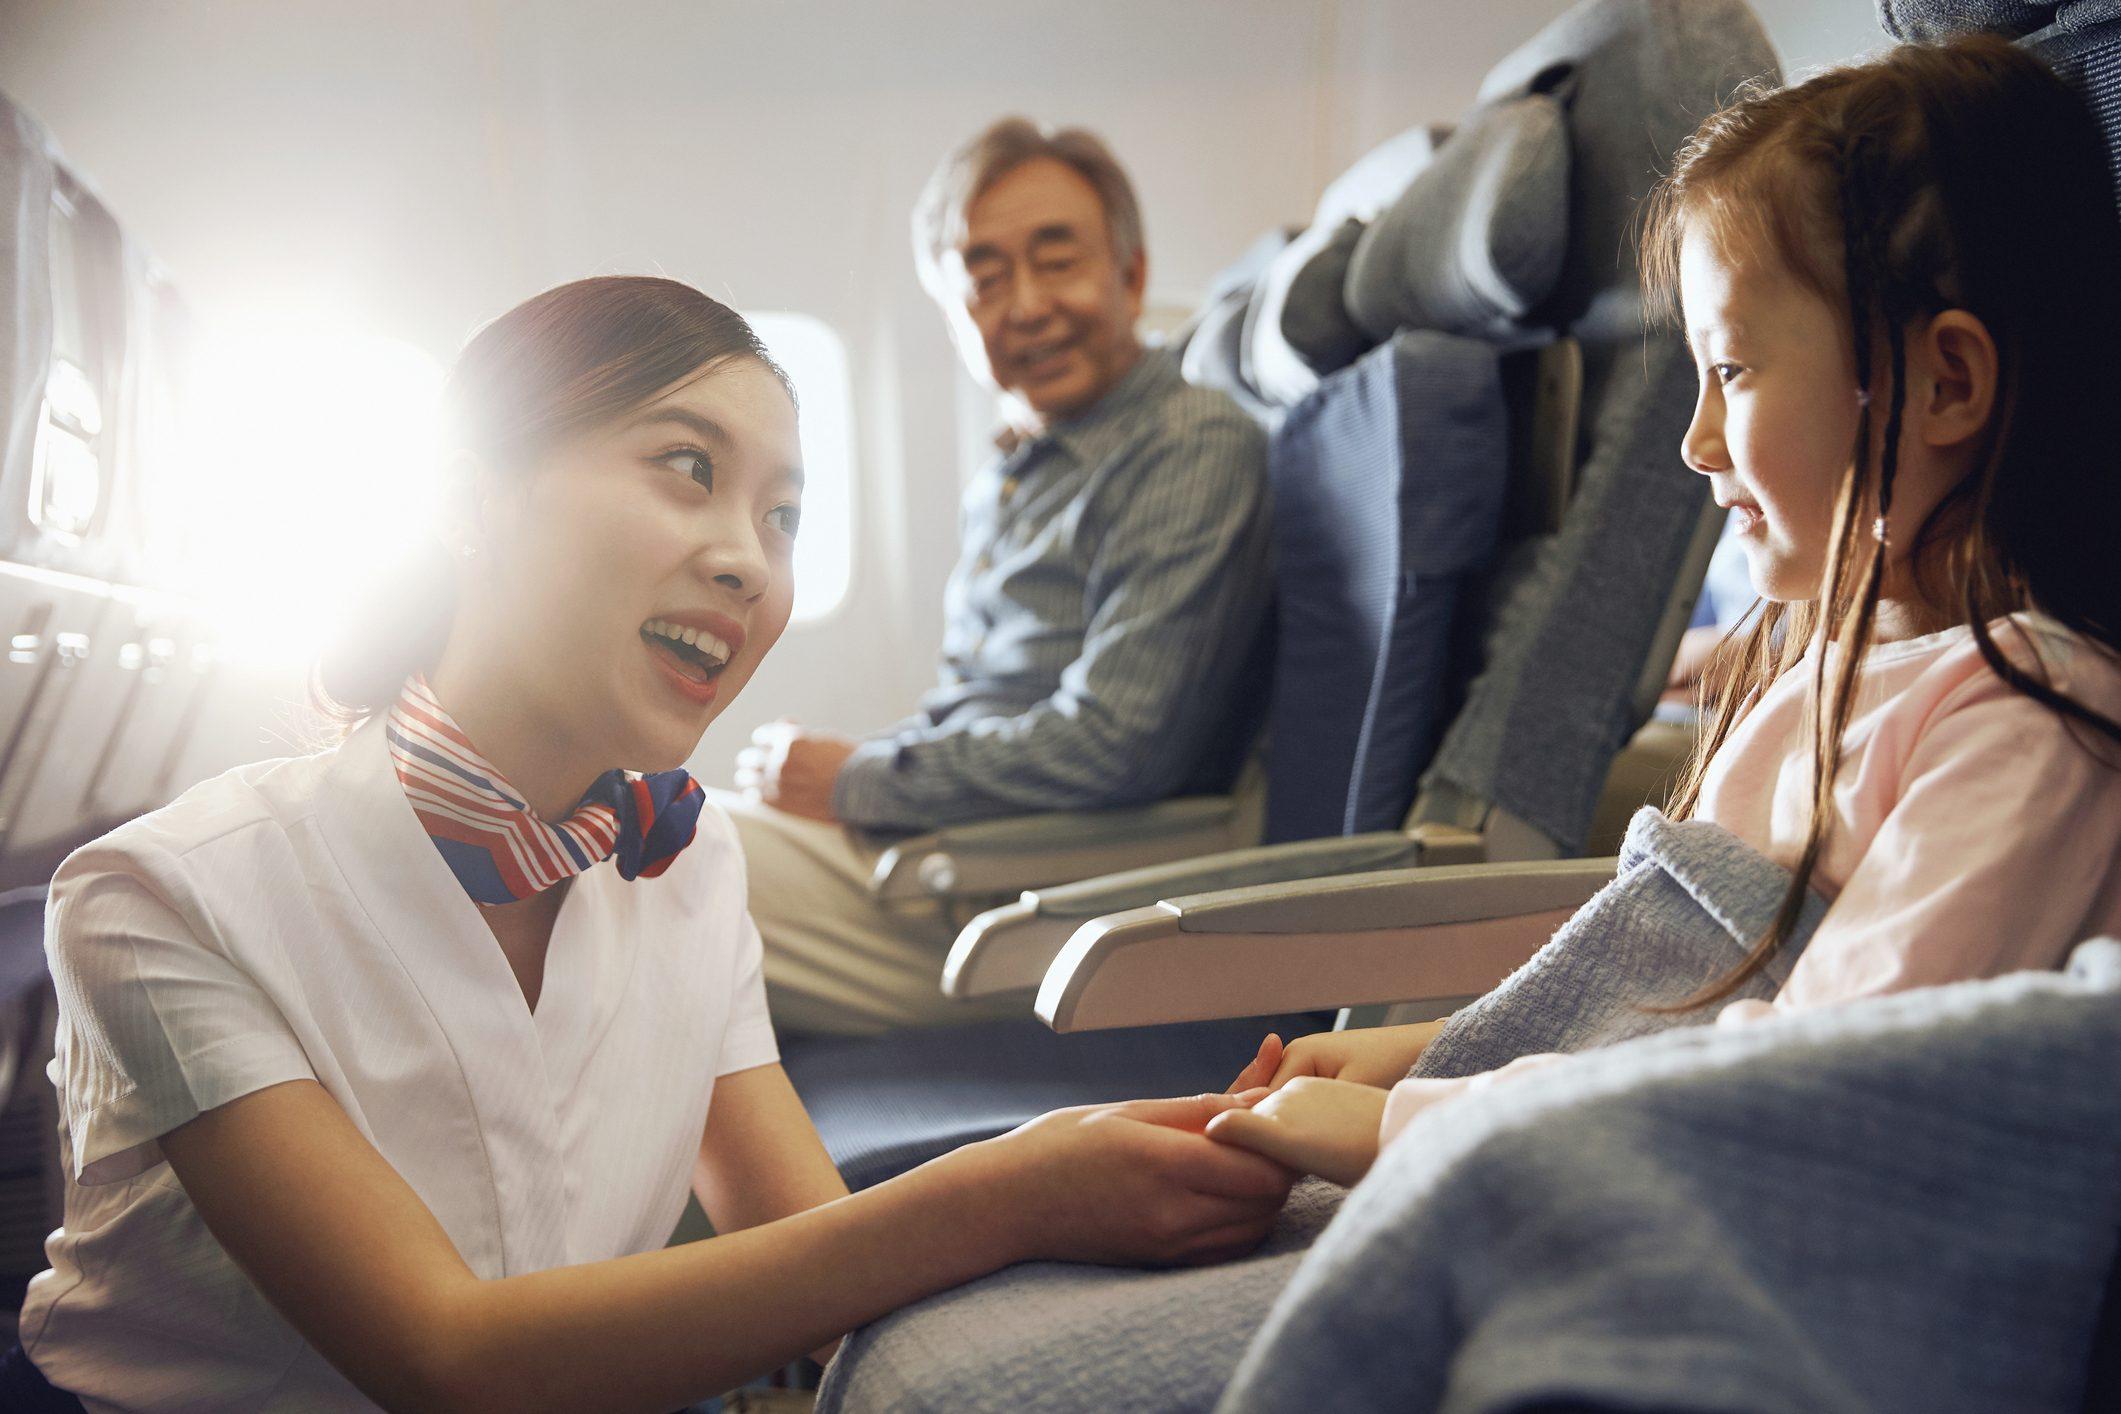 Flight attendants and passengers on the plane